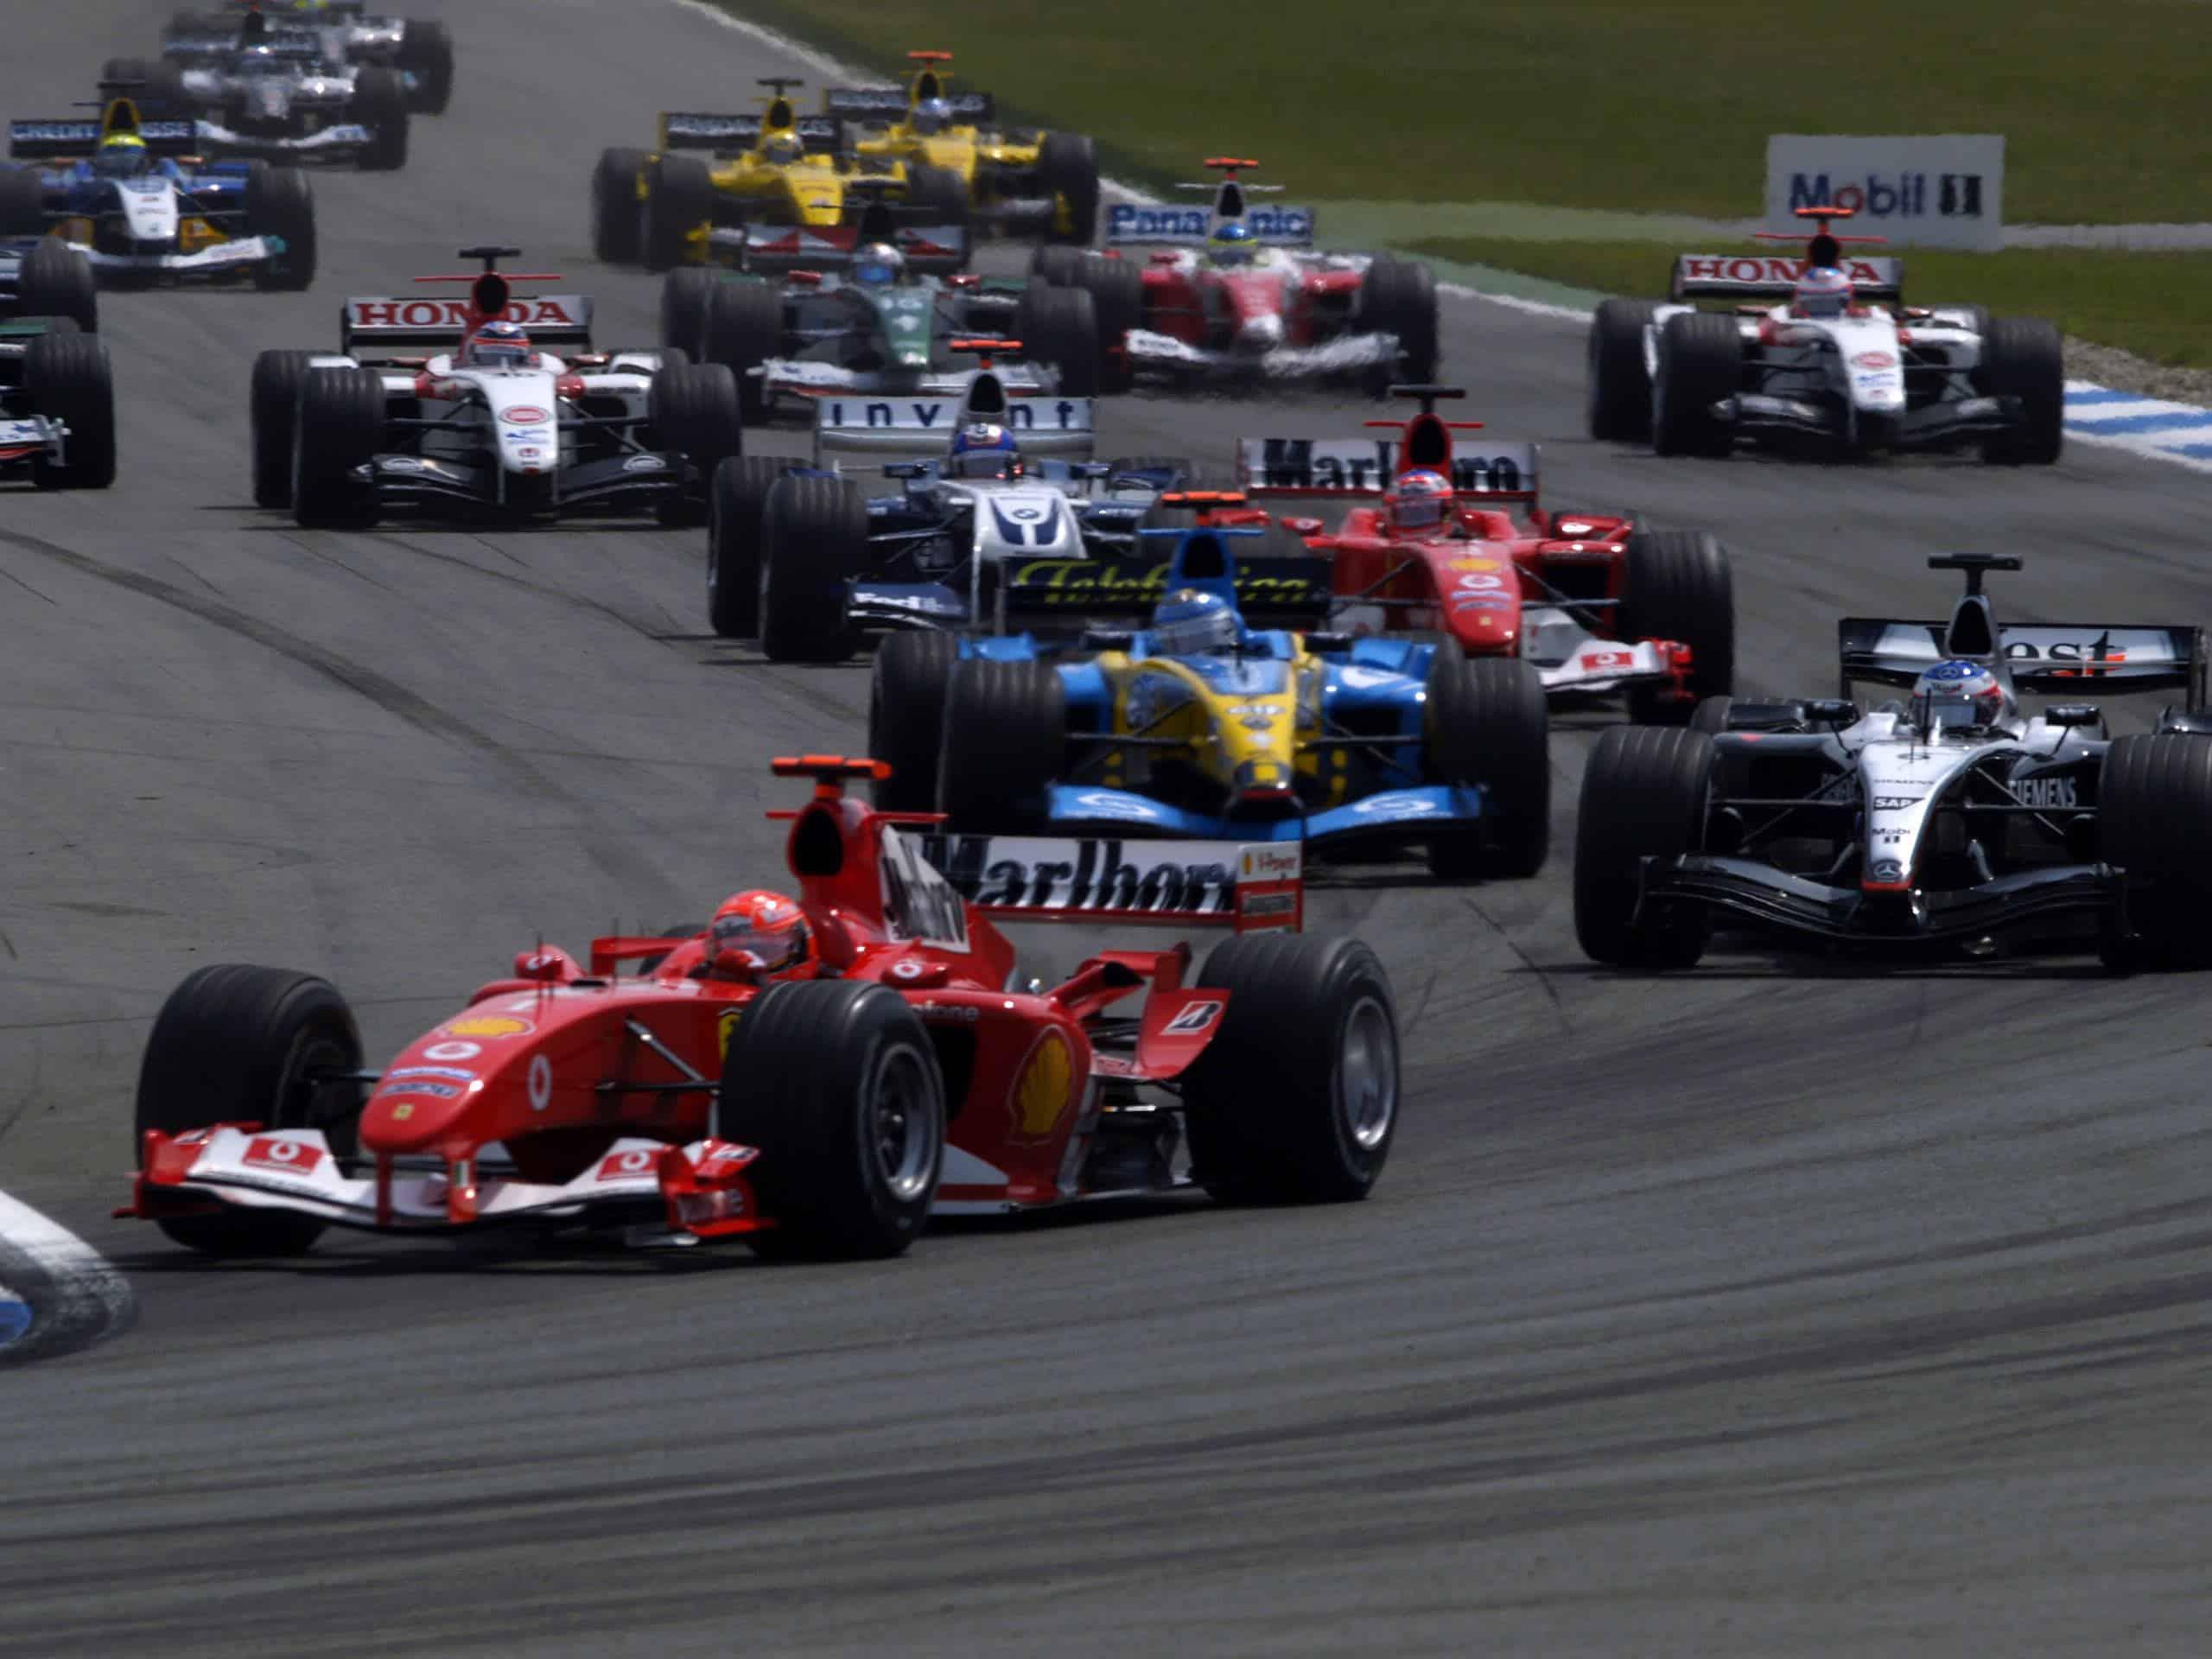 Michael-Schumacher-Ferrari-F2004-German-GP-F1-2004-race-start-Hockenheim-Photo-Ferrari